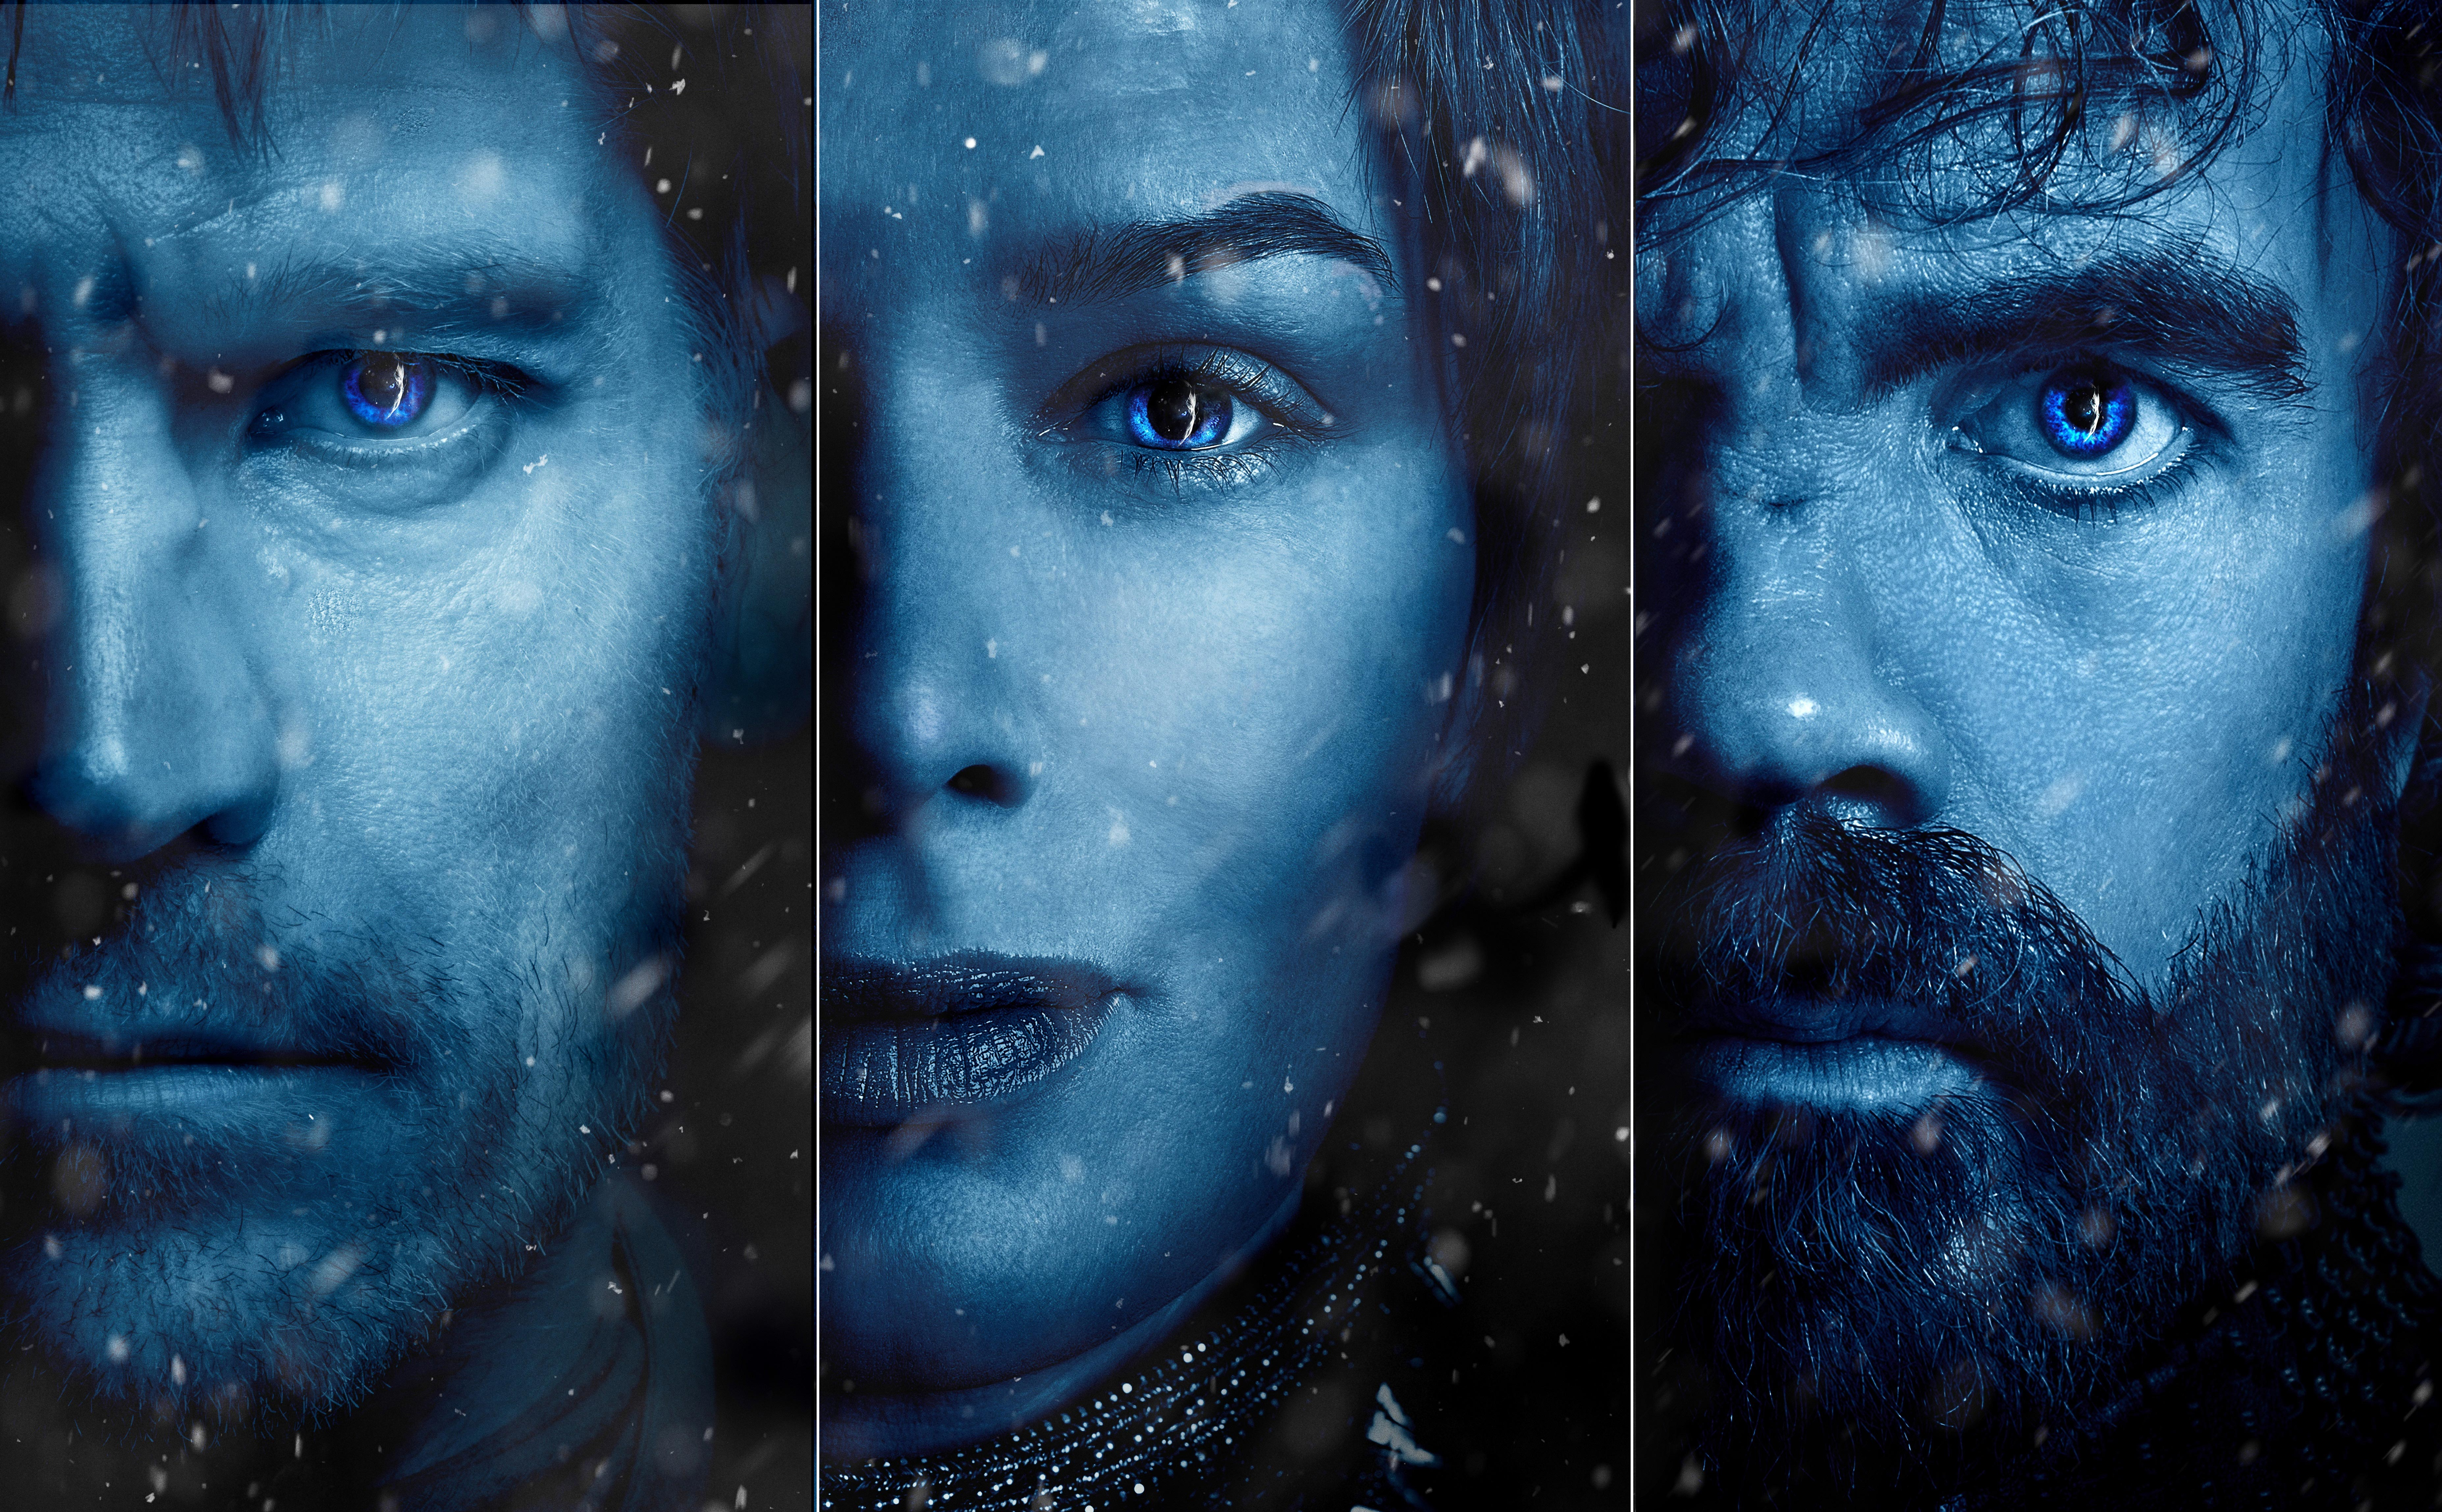 Tyrion Lannister Jaime Lannister Cersei Lannister Posters